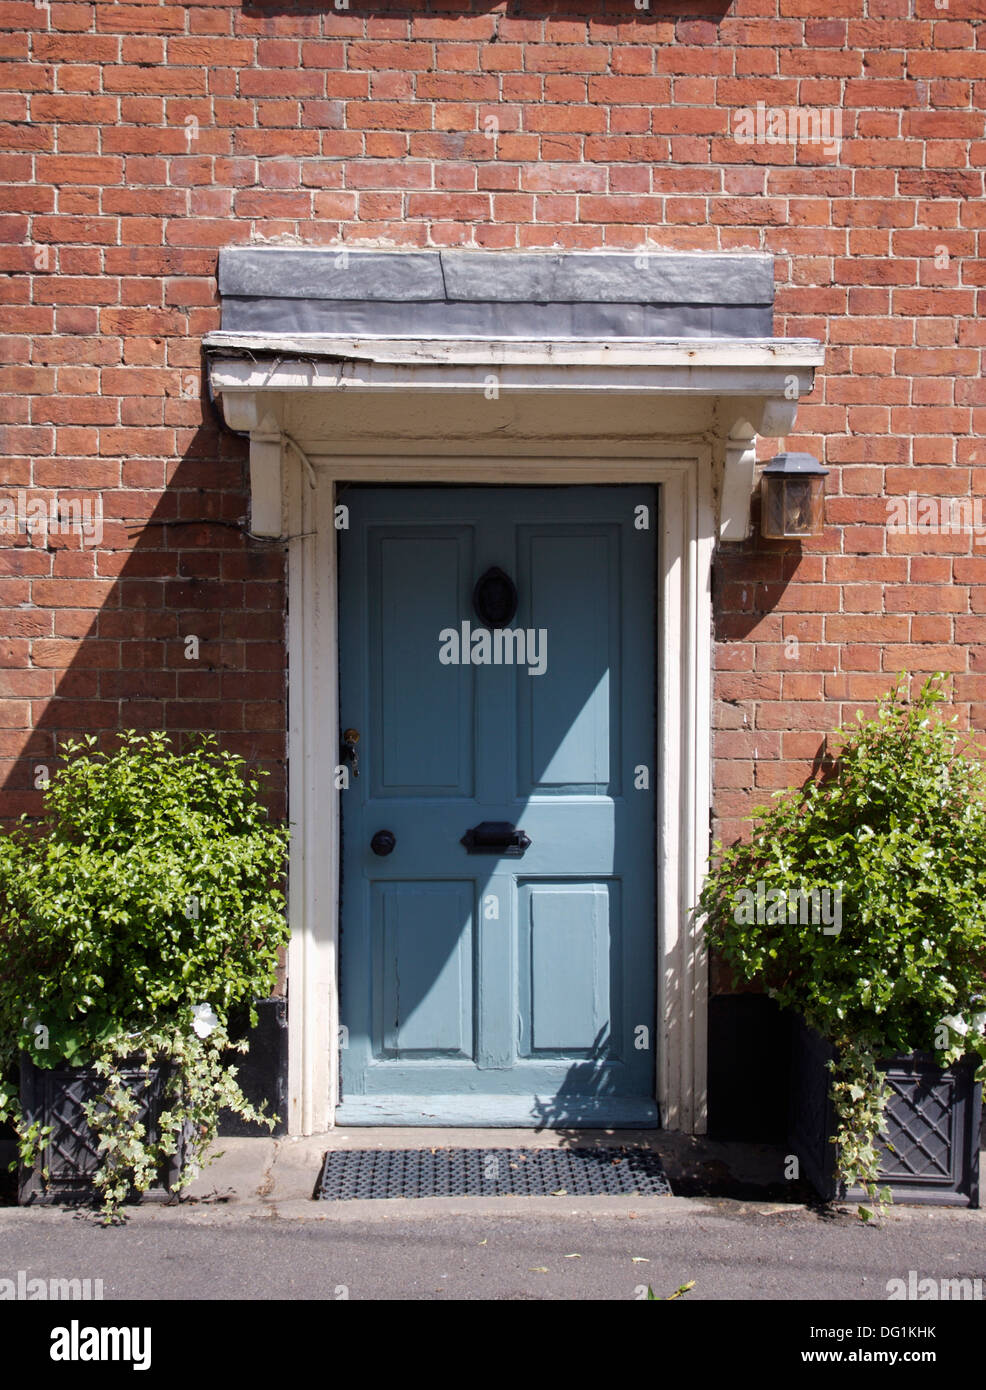 Green shrubs in pots on either side of blue front door in for Blue green front door